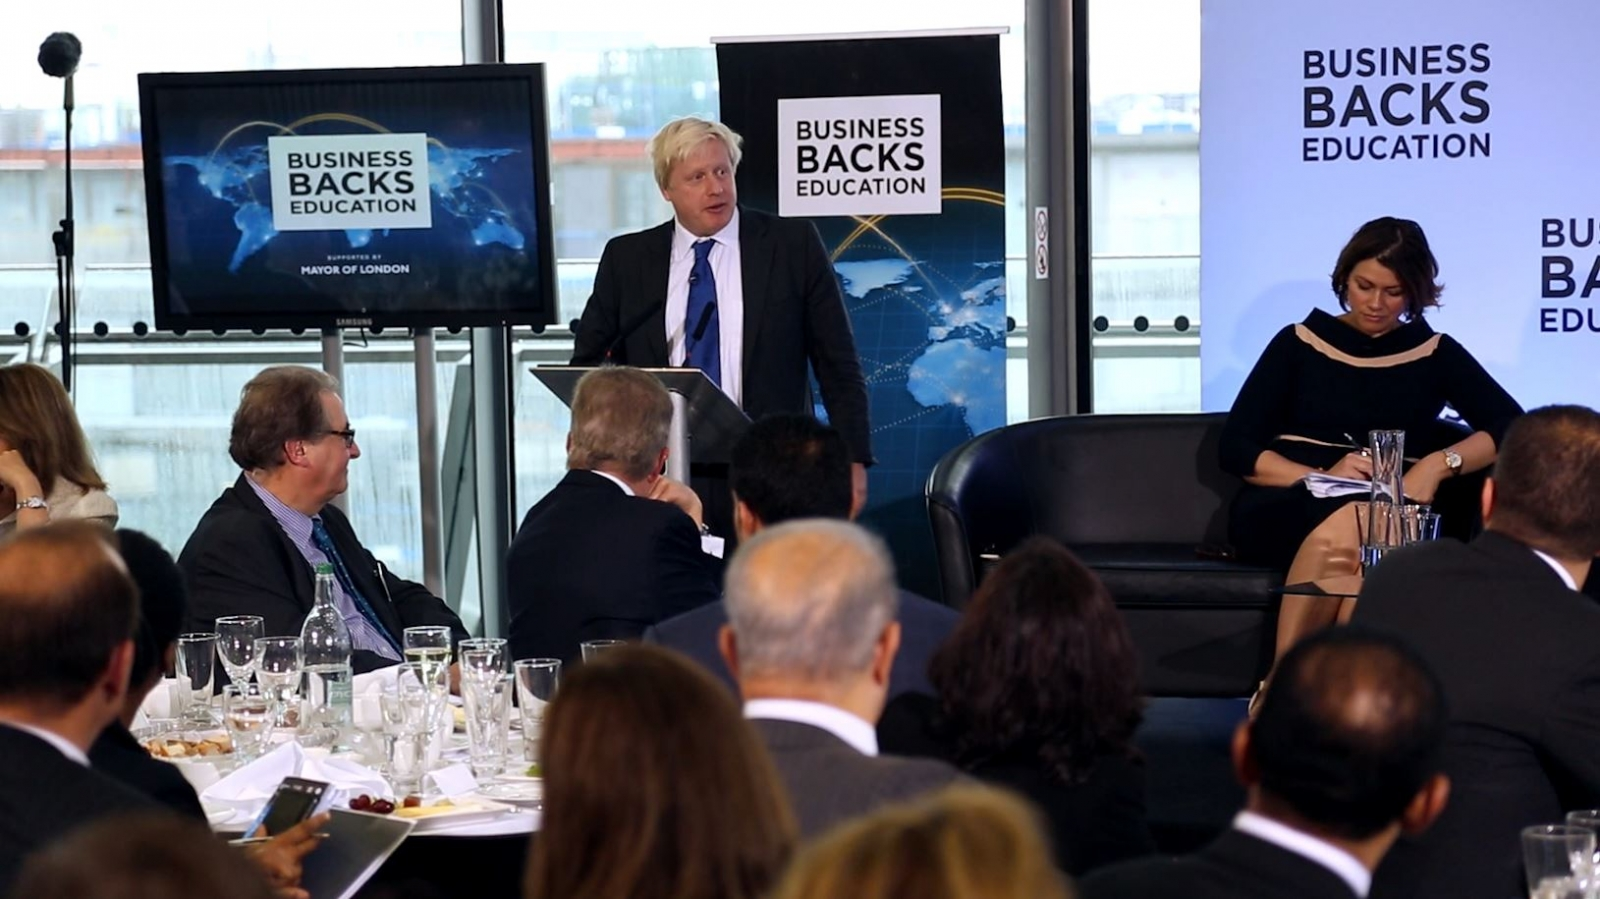 Boris Johnson: UK's Failure to Prepare Children for the World of Work is Criminal